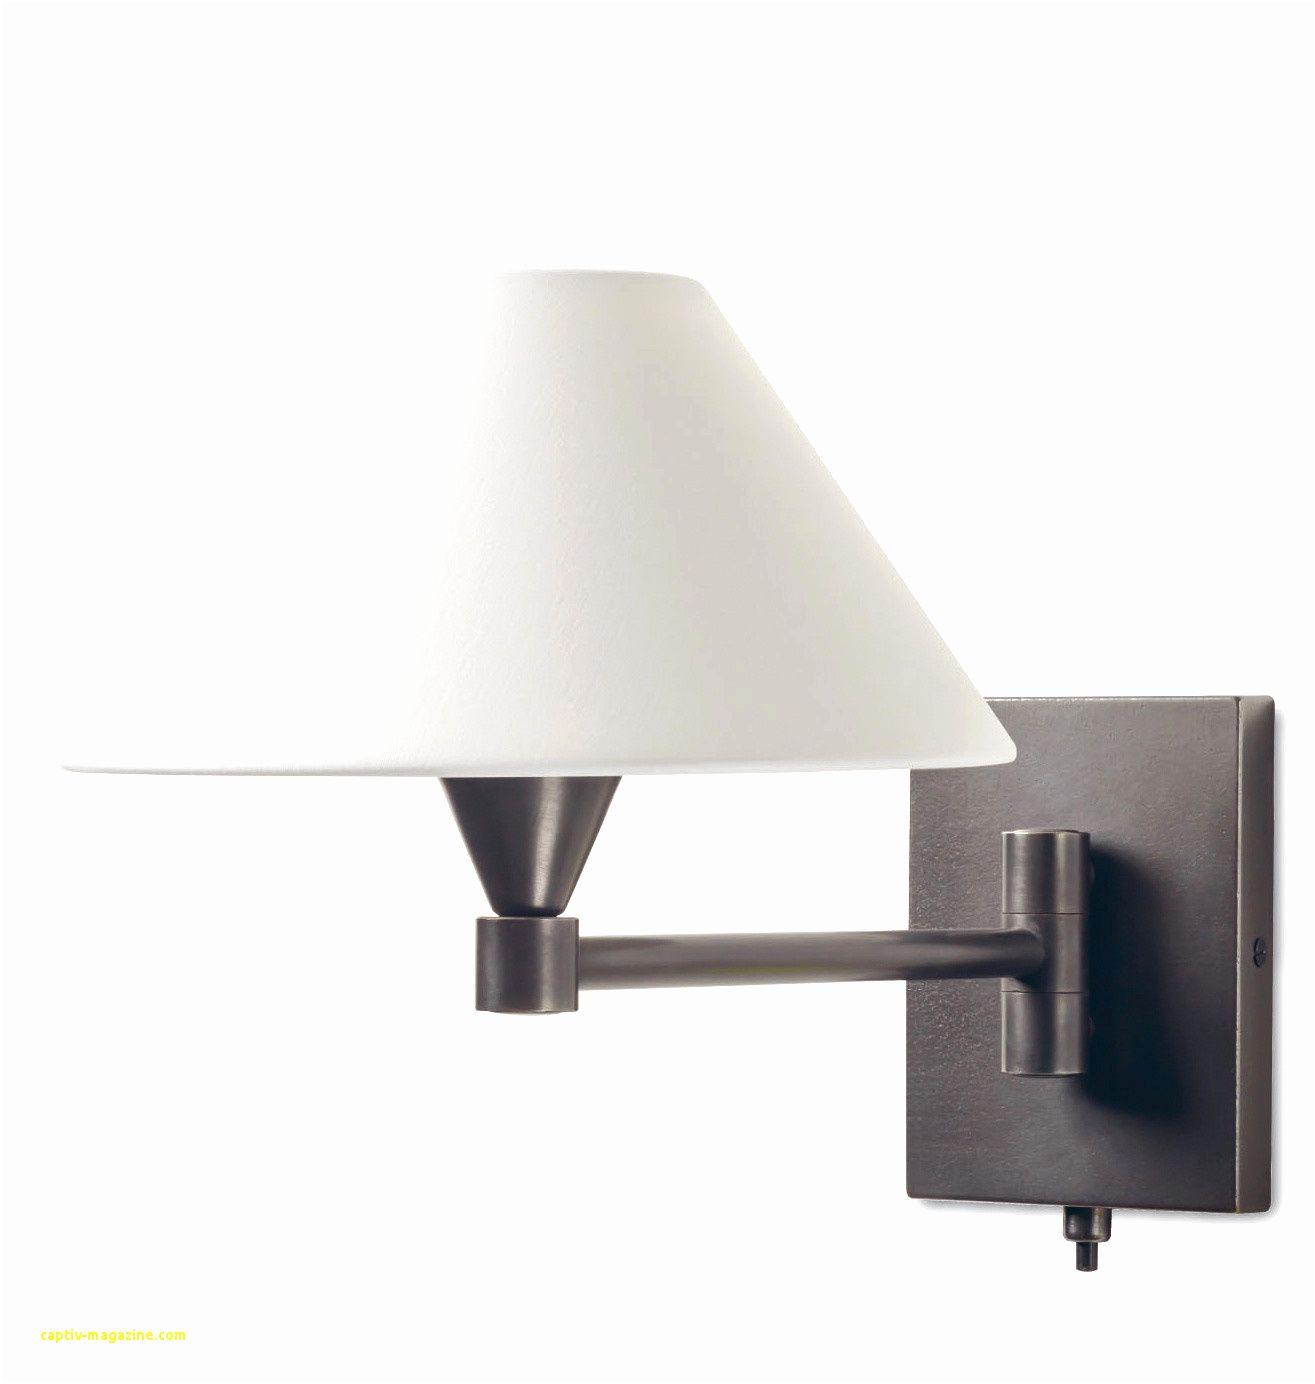 20 Creatif Applique Ikea Images